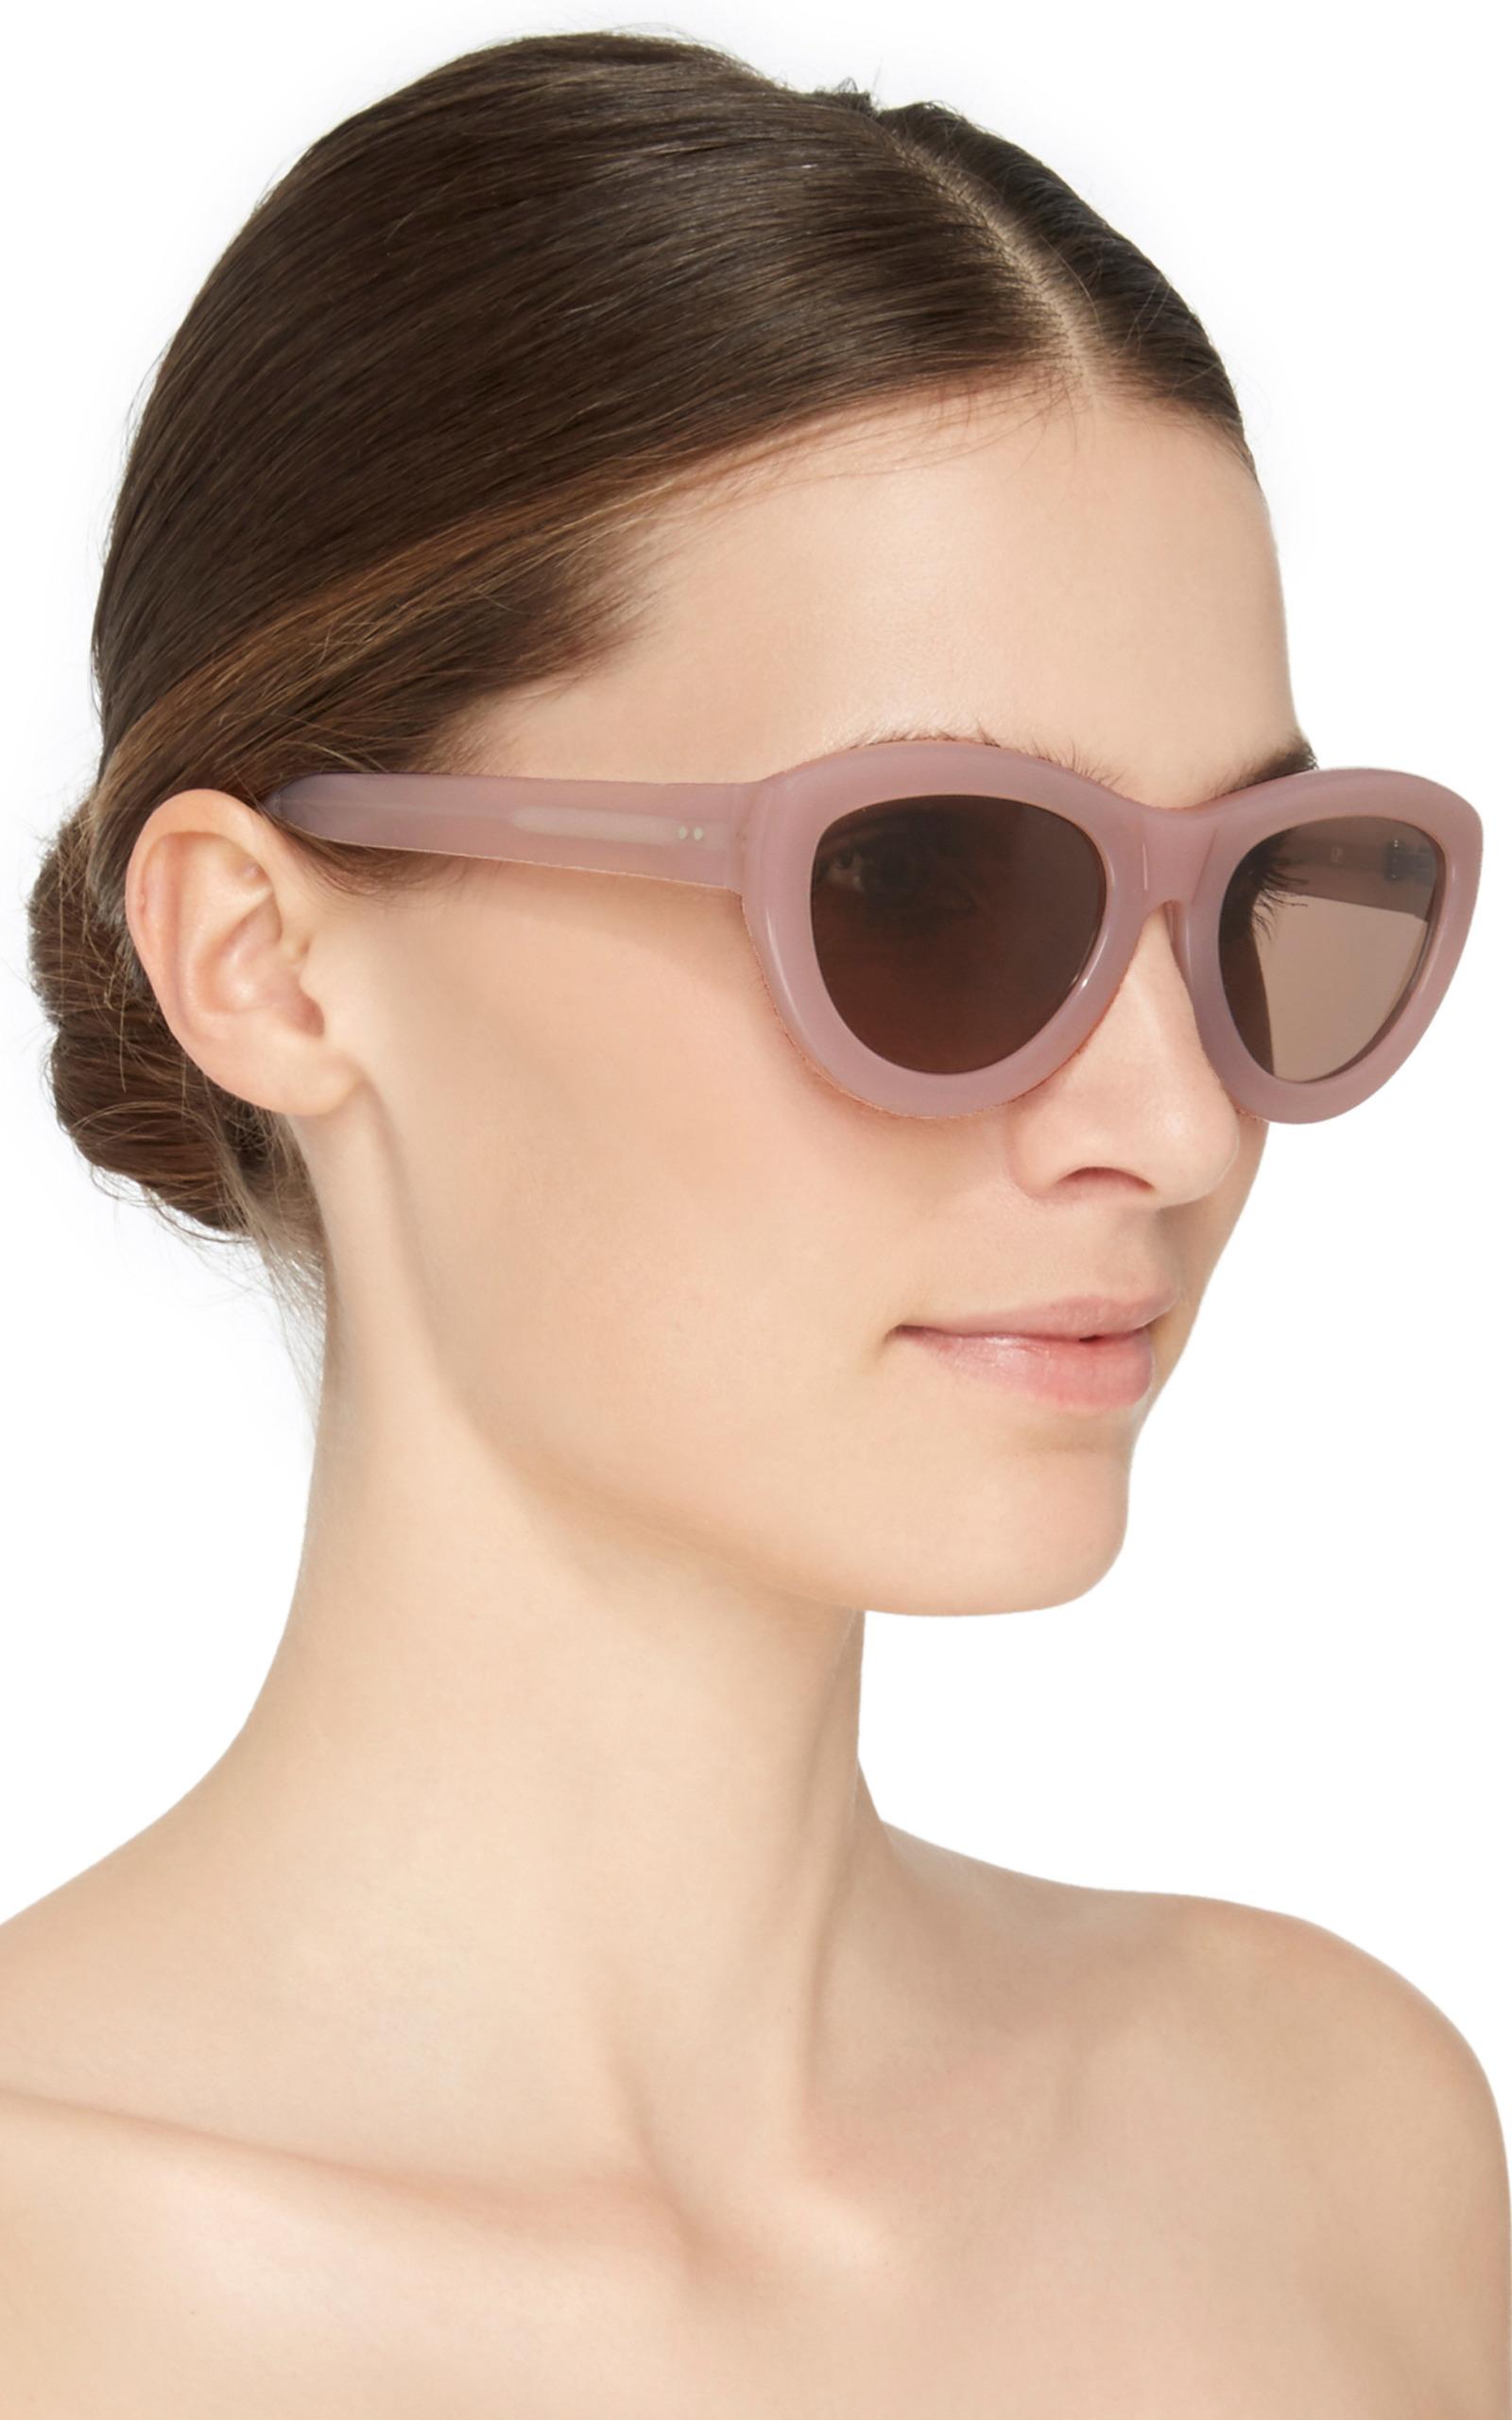 Dries Van Noten Pink Sunglasses Linda Farrow EKC1rzgl